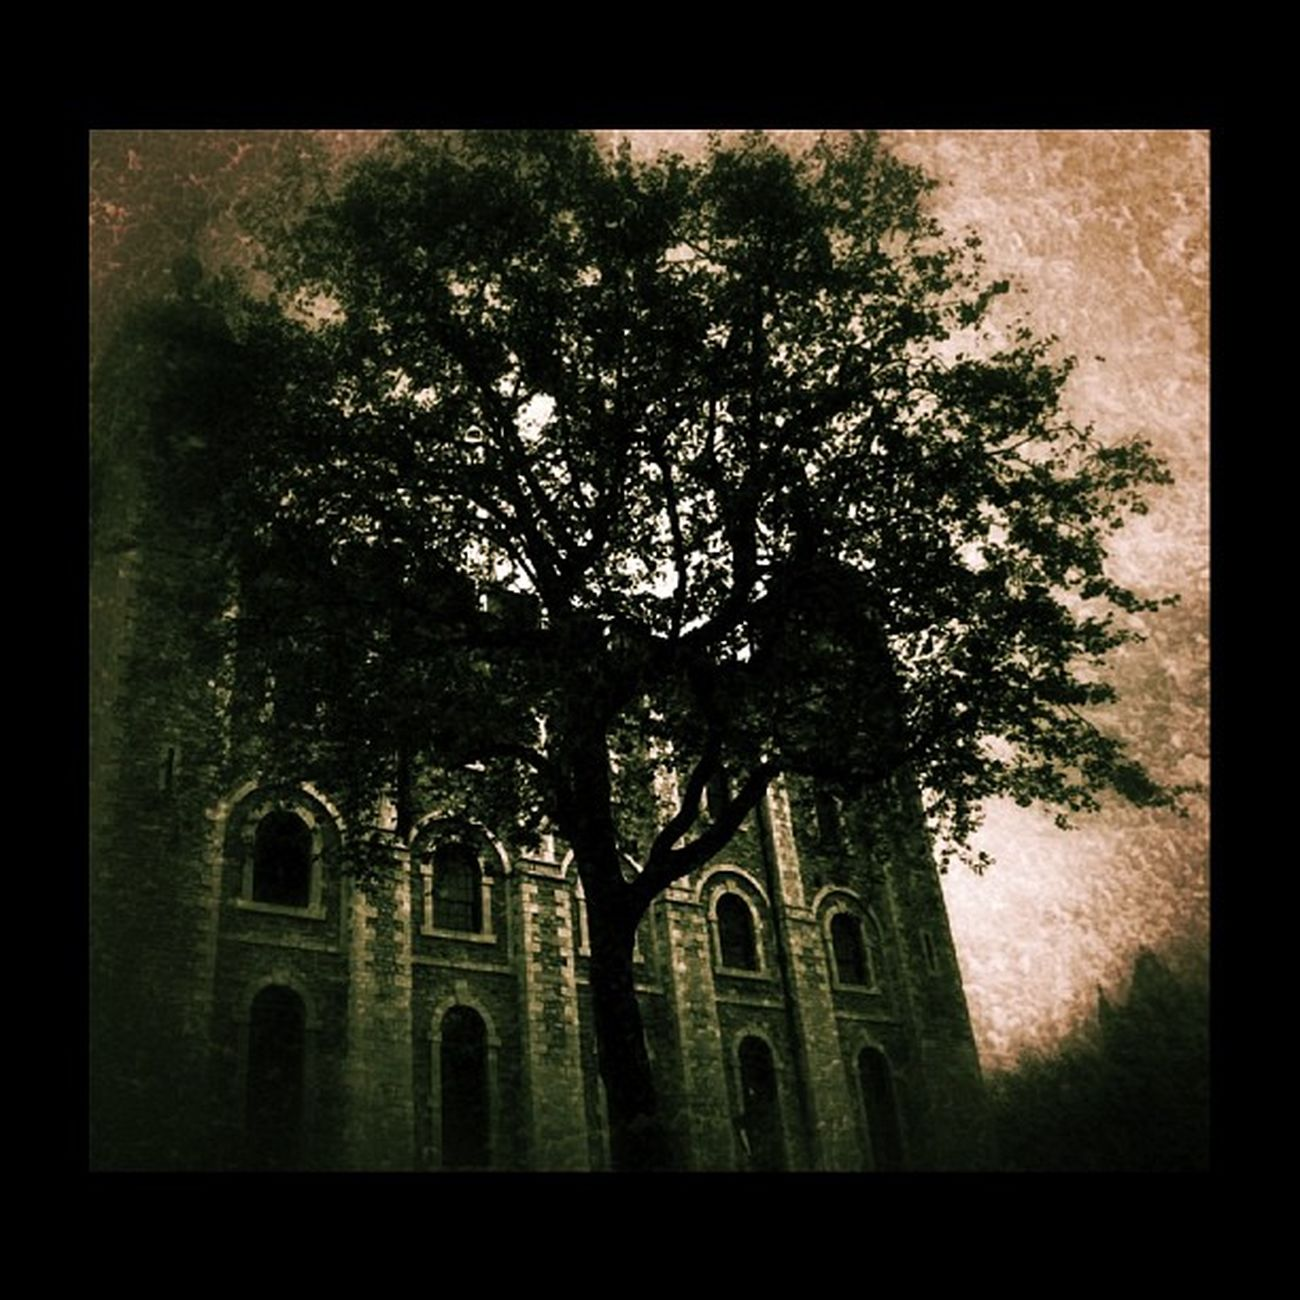 #grunge #dark #creepy #igdungeon #rsa_dark Creepy Grunge Dark Igdungeon Rsa_dark Masters_of_darkness United_by_darkness Igd_realmofthedead Ig_4every1_spooky Thehorrorgallery